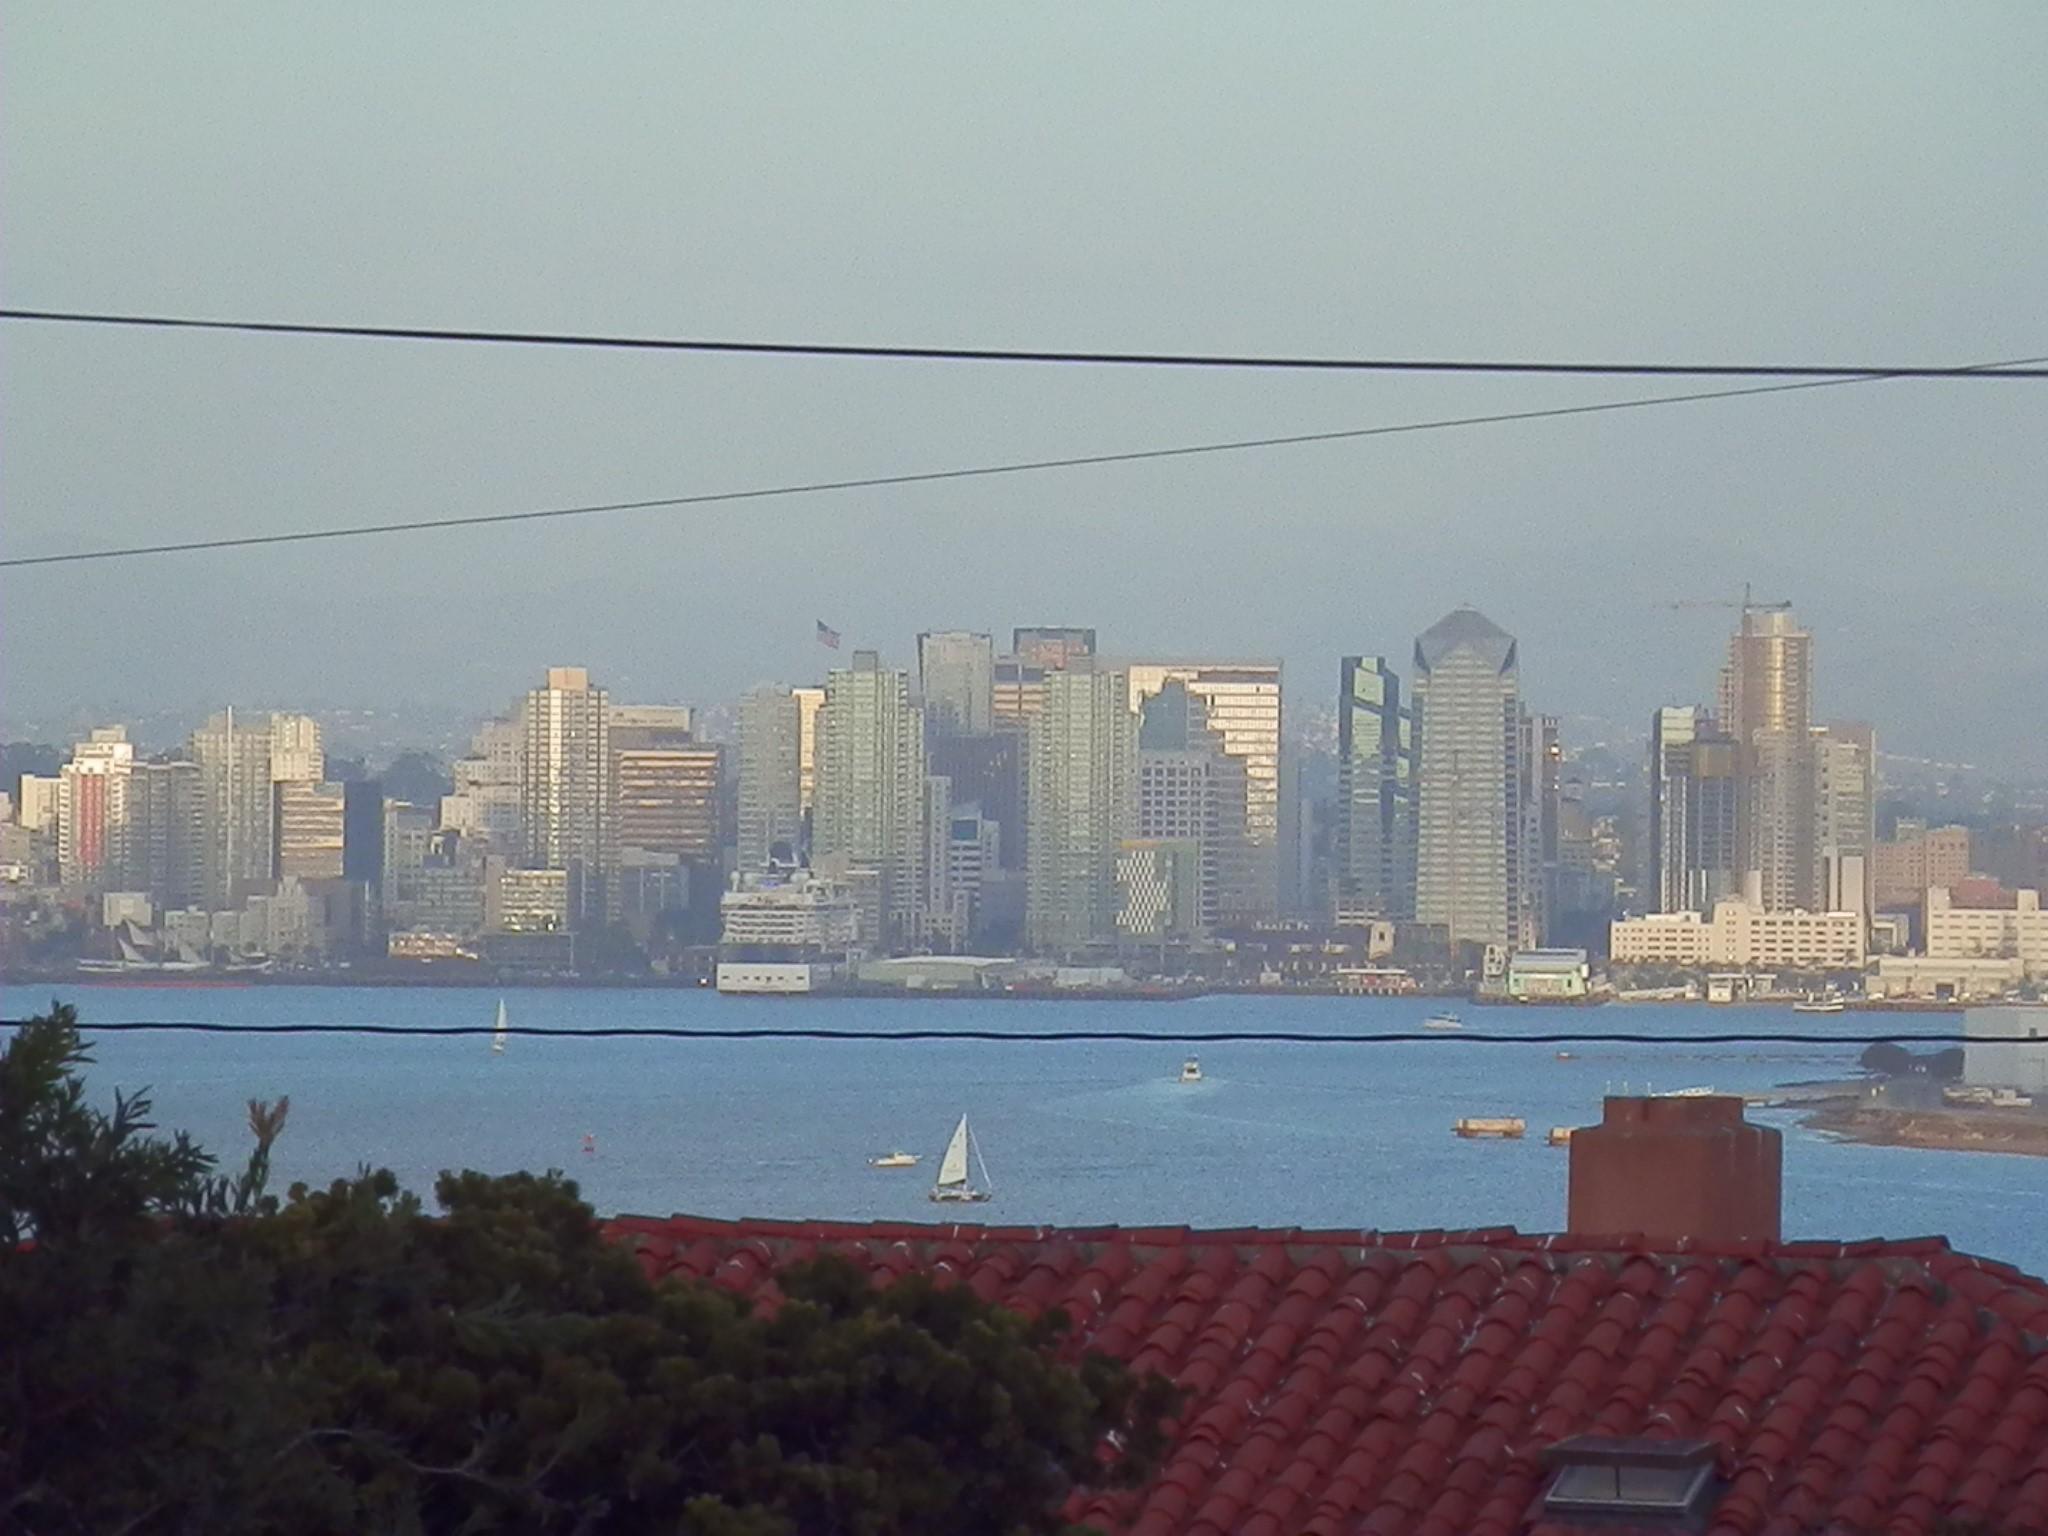 (A shot of the San Diego skyline from the La Playa neighborhood / Scott Beyer)